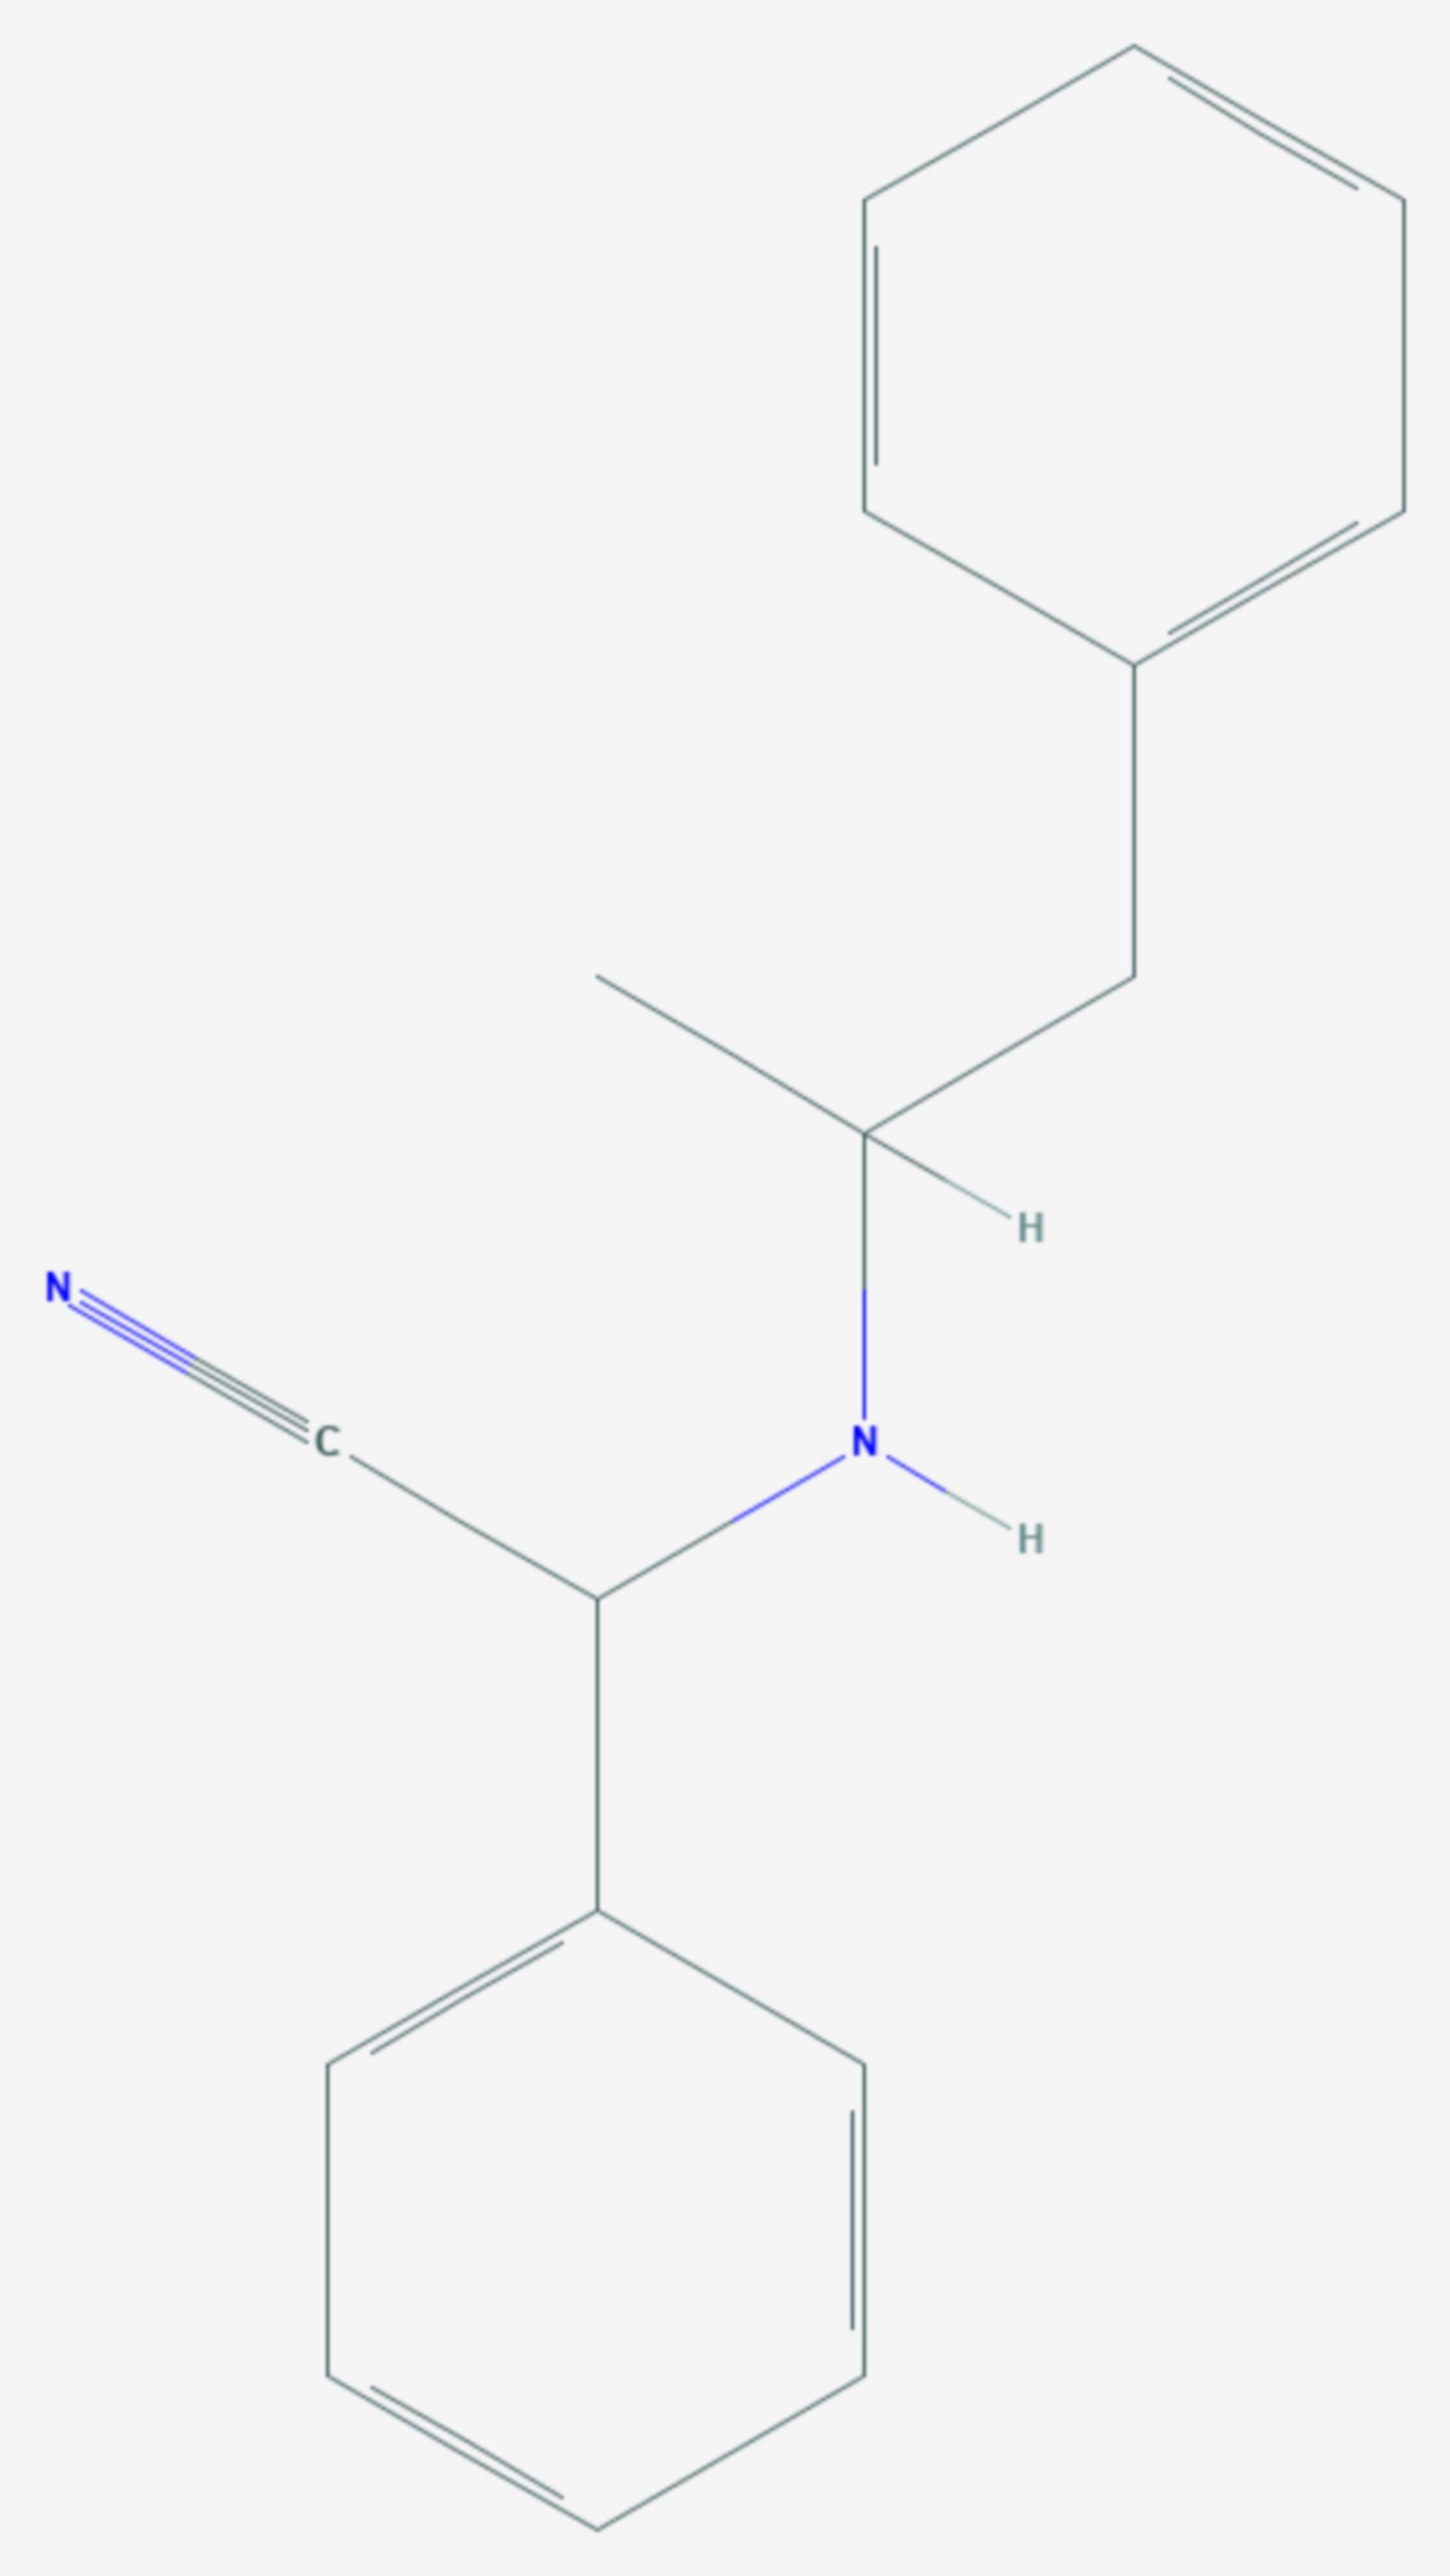 Amphetaminil (Strukturformel)